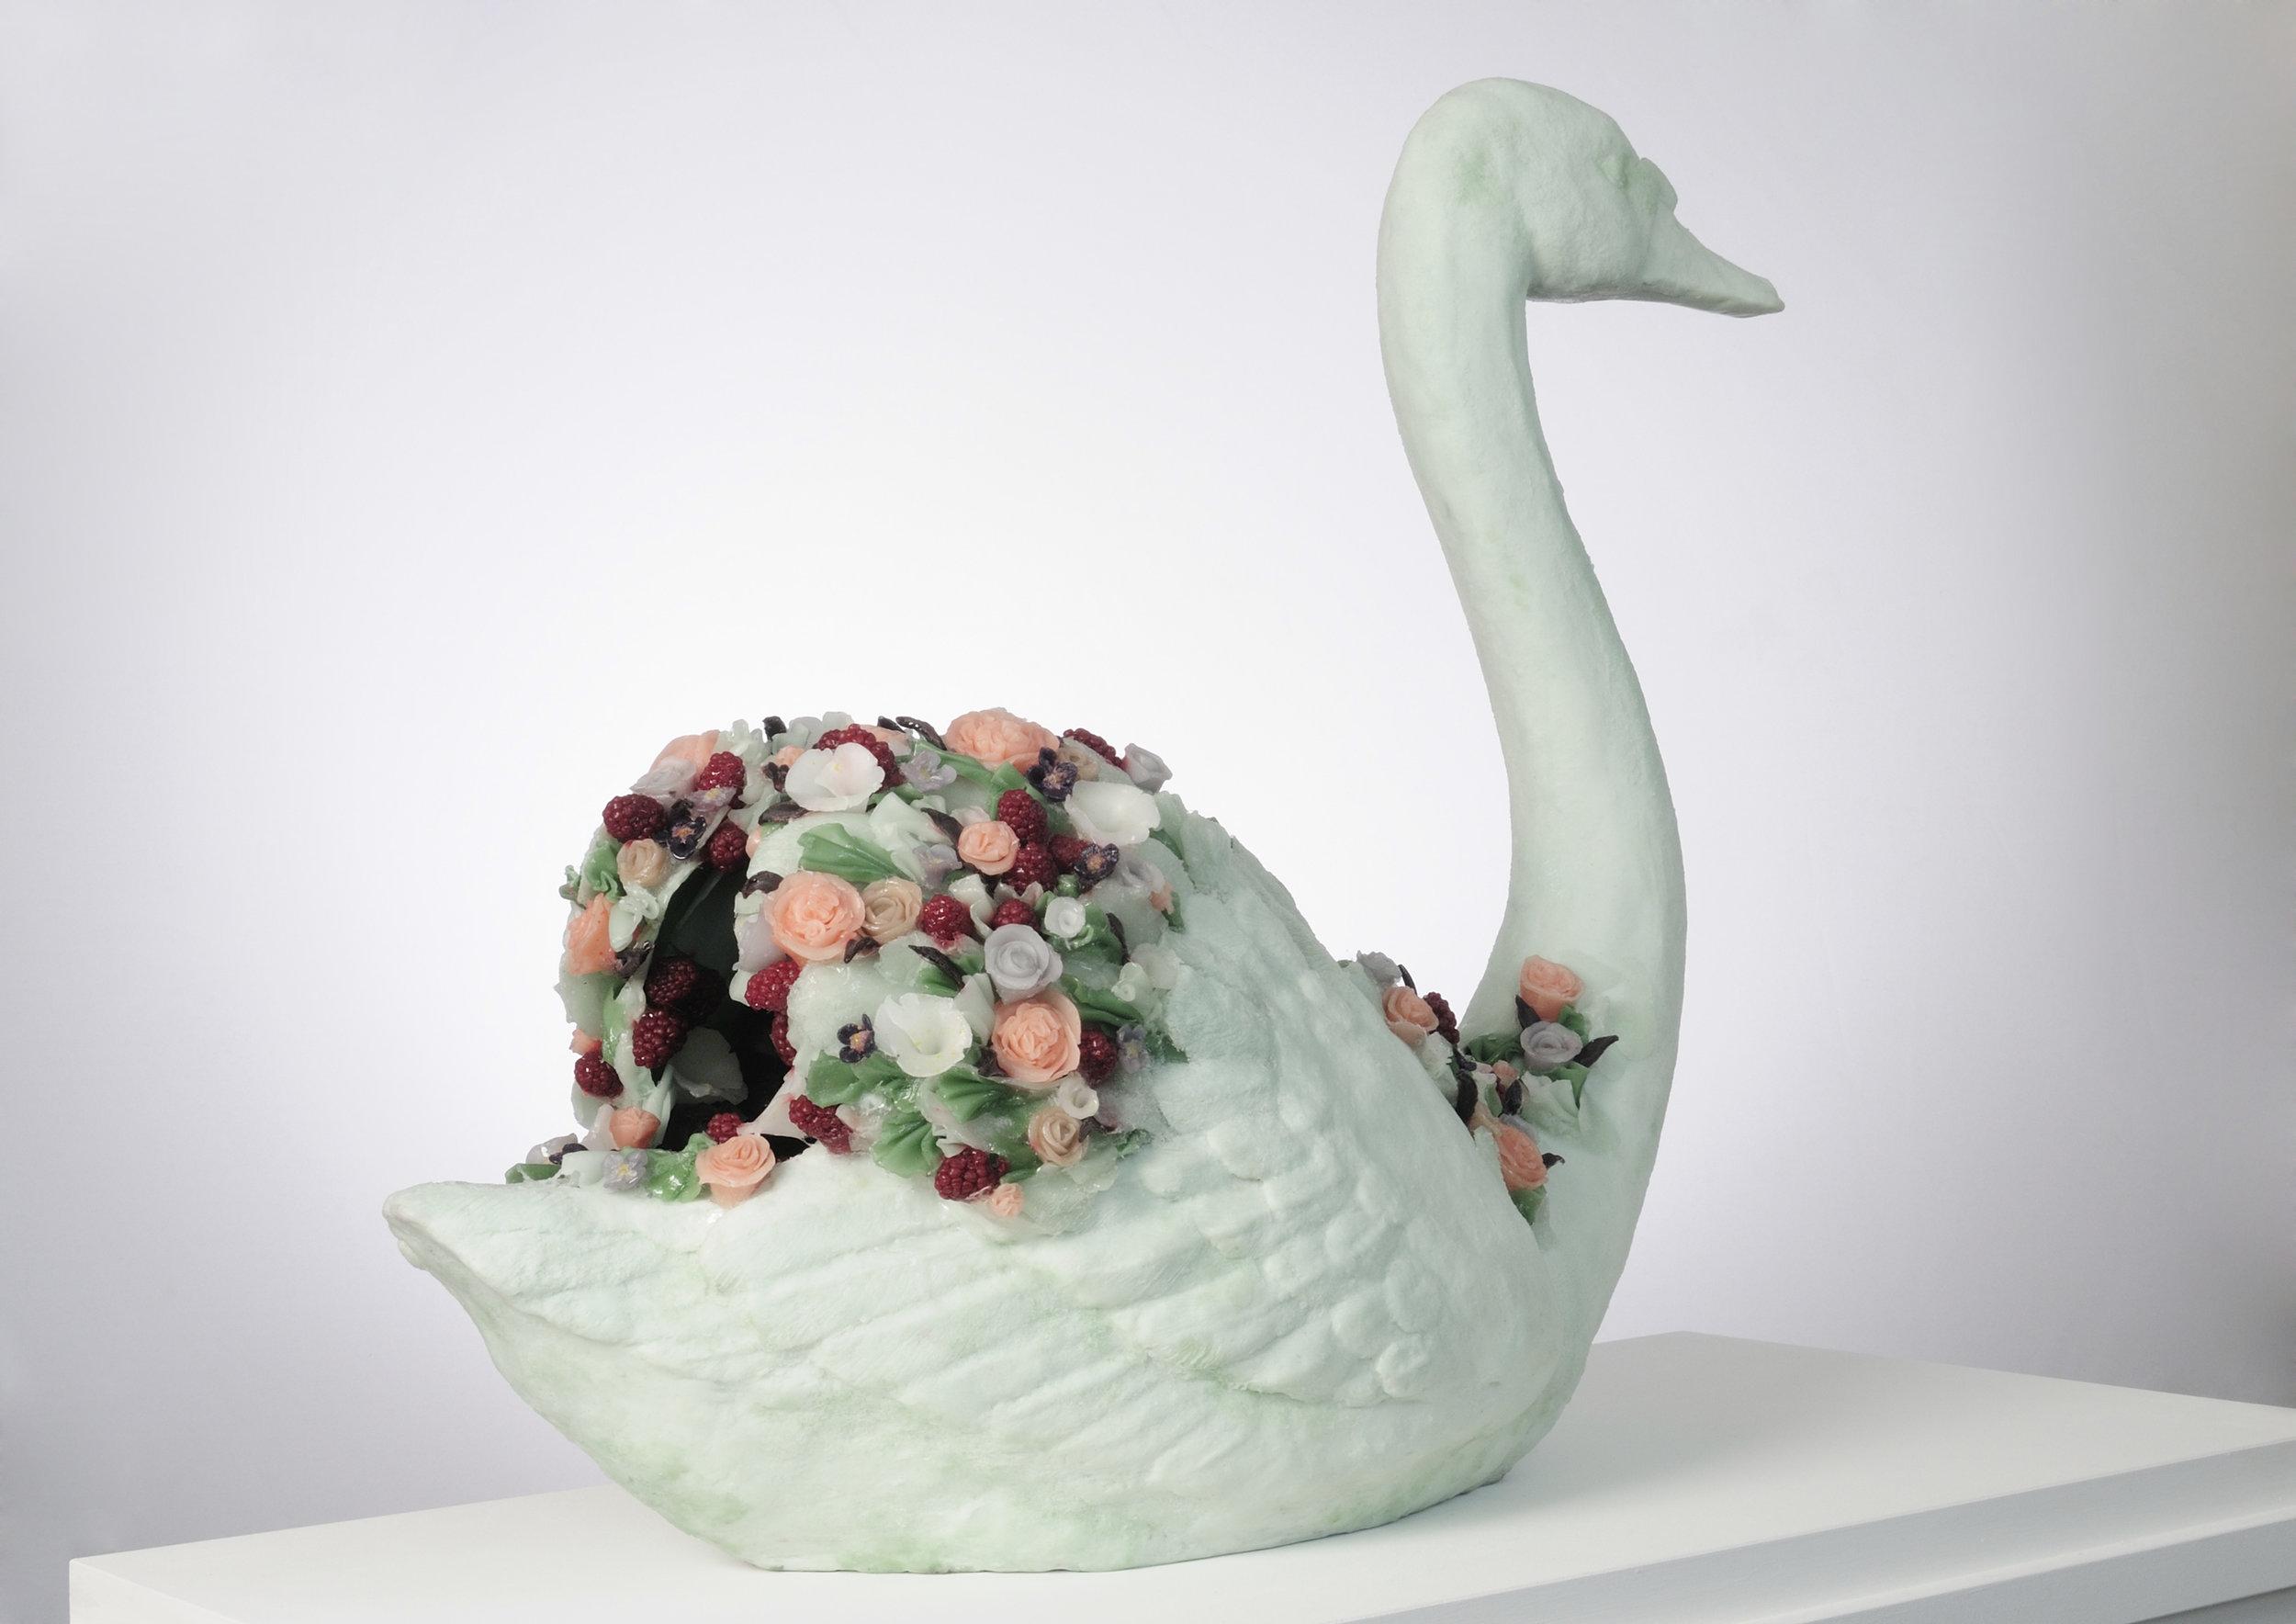 Luxe Vert, 2008, Polyester resin, wax, 80 x 65 x 35cm, £8,800